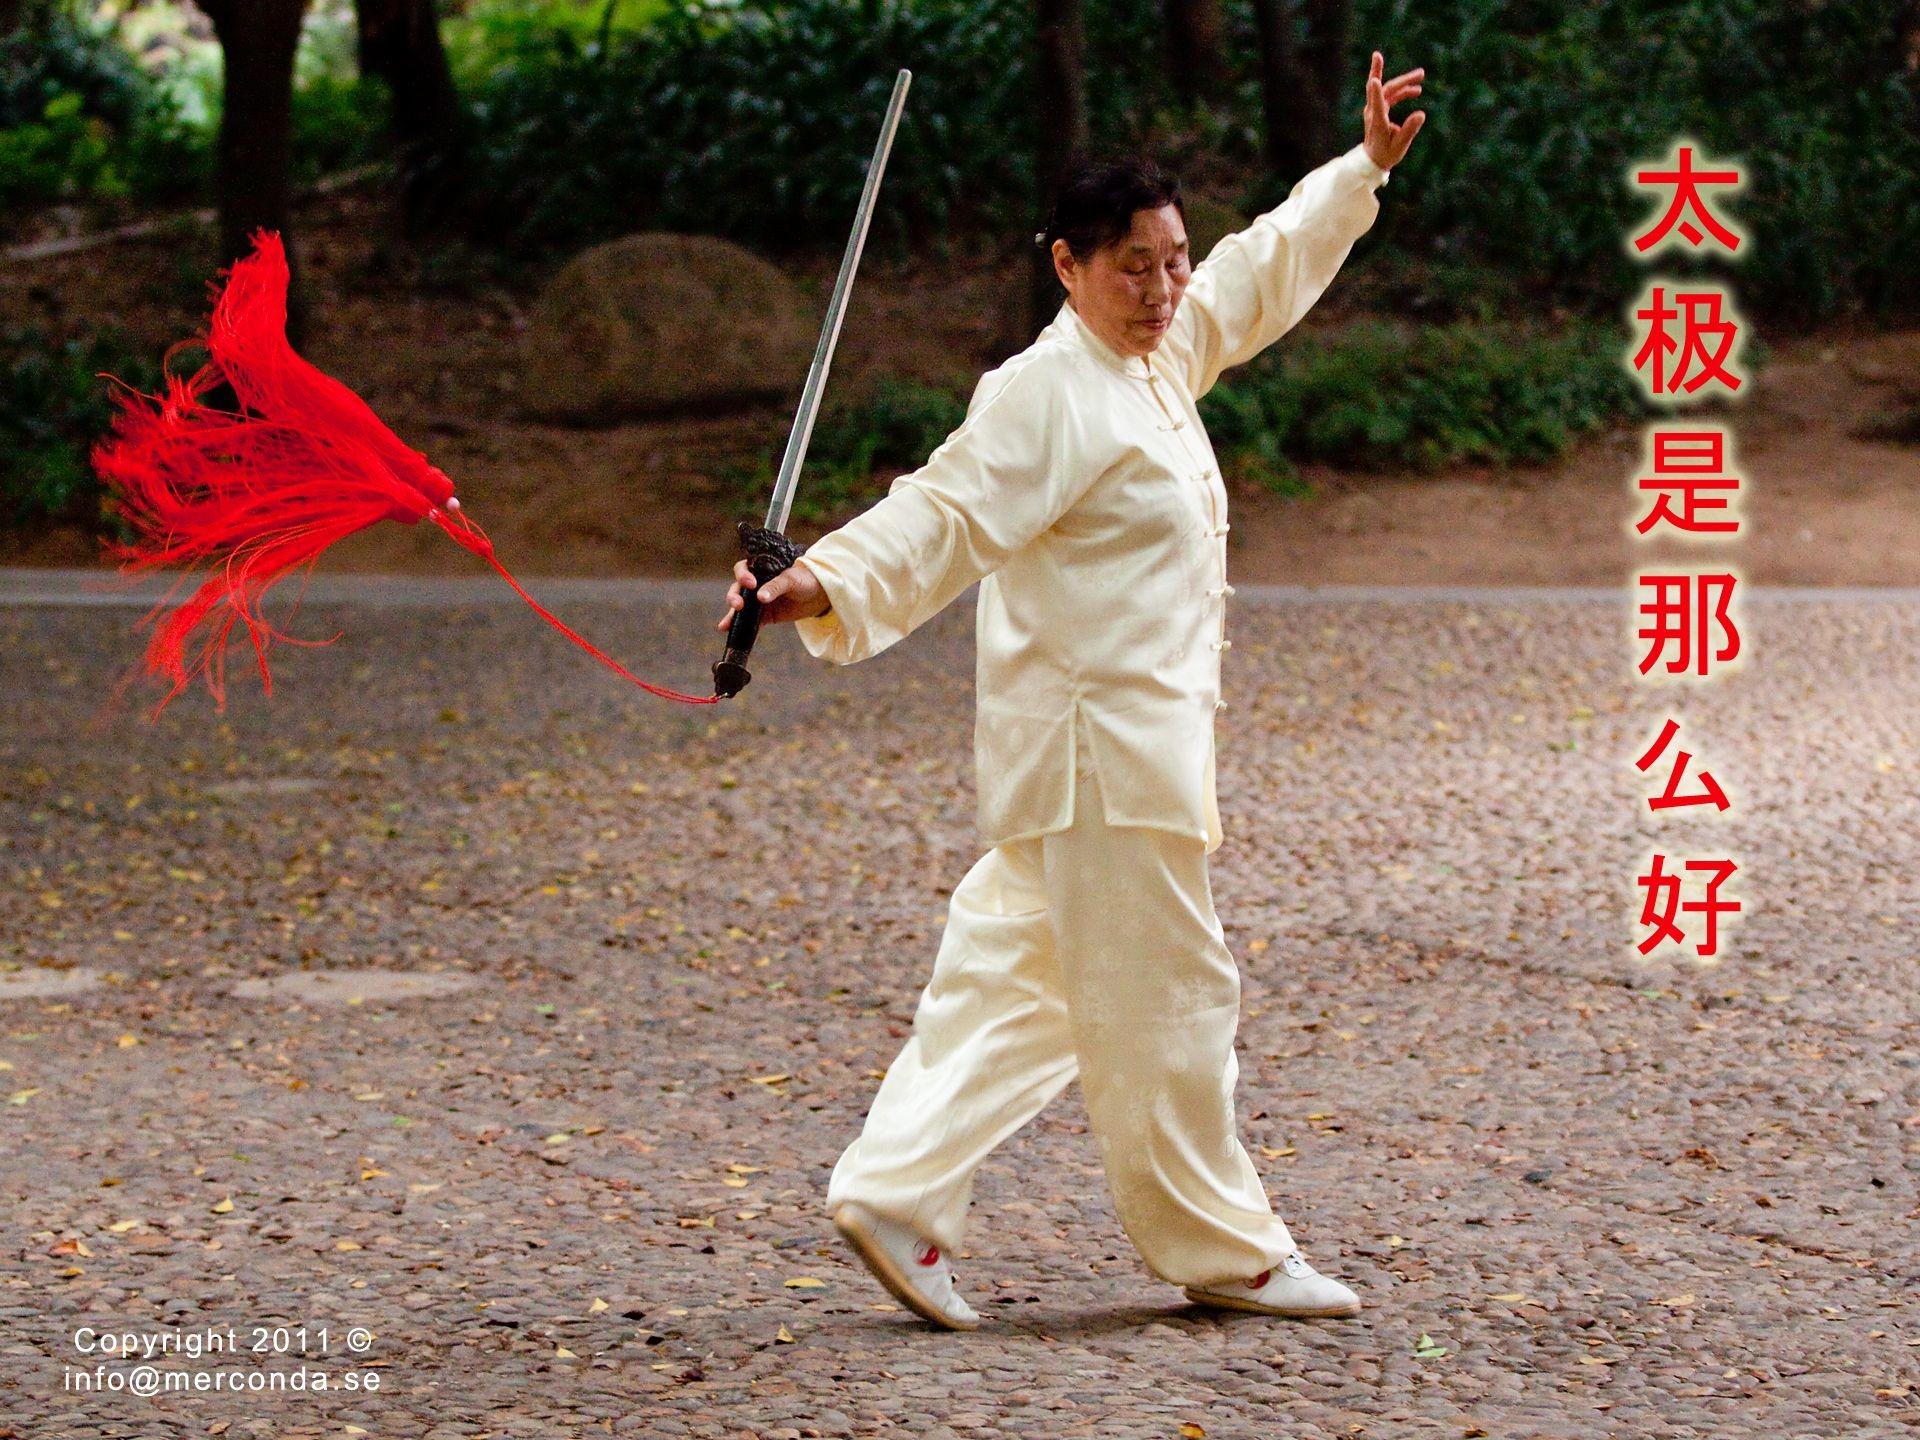 Kung Fu Panda Wallpaper Cute Tai Chi Wallpaper 183 ① Wallpapertag